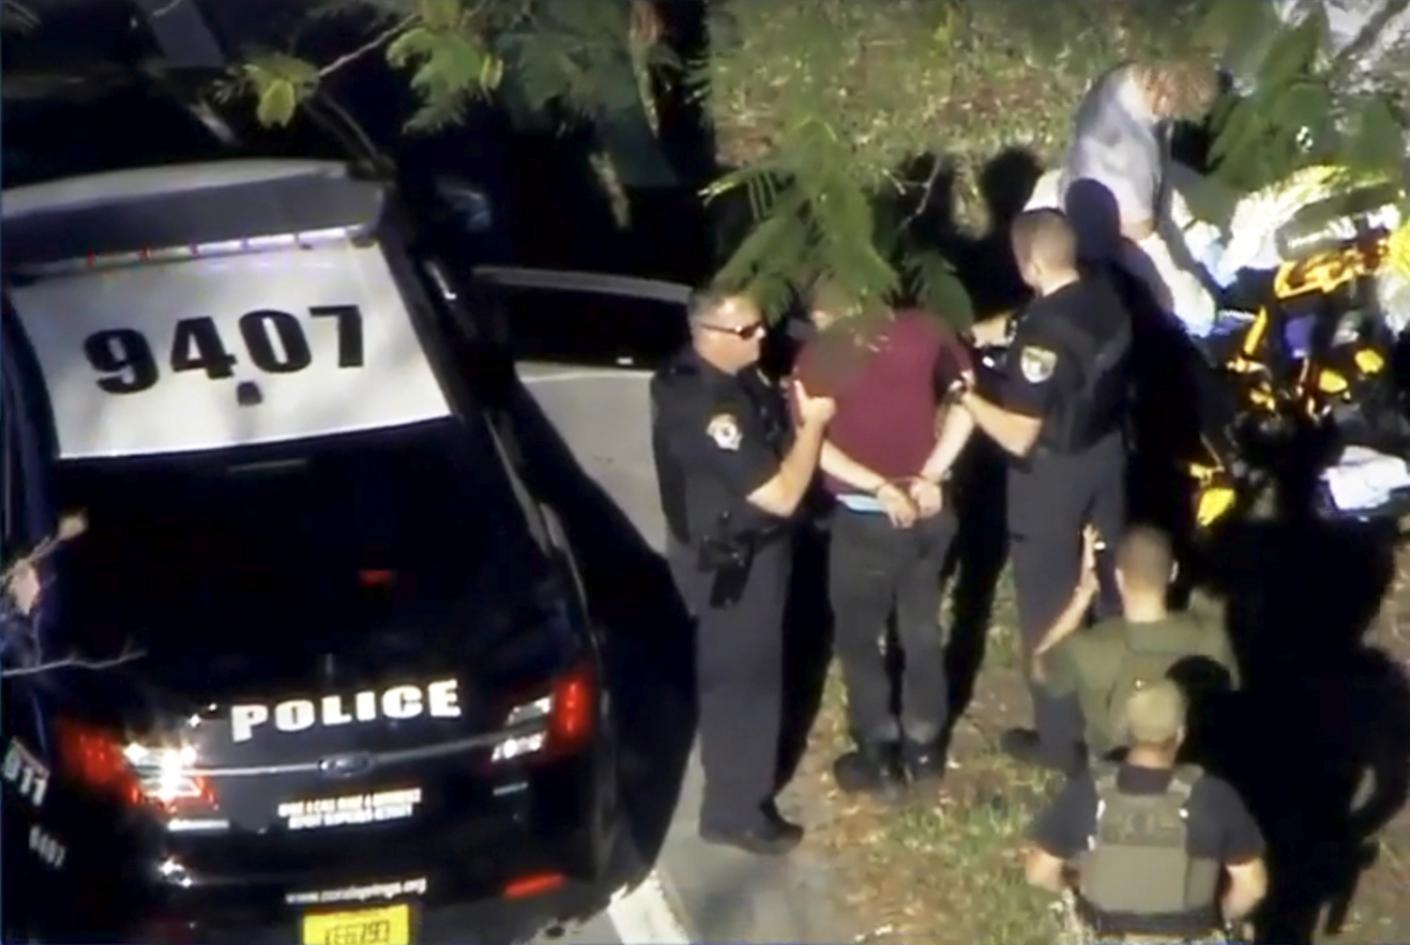 Ex-student arrested after 17 shot dead at Florida high school